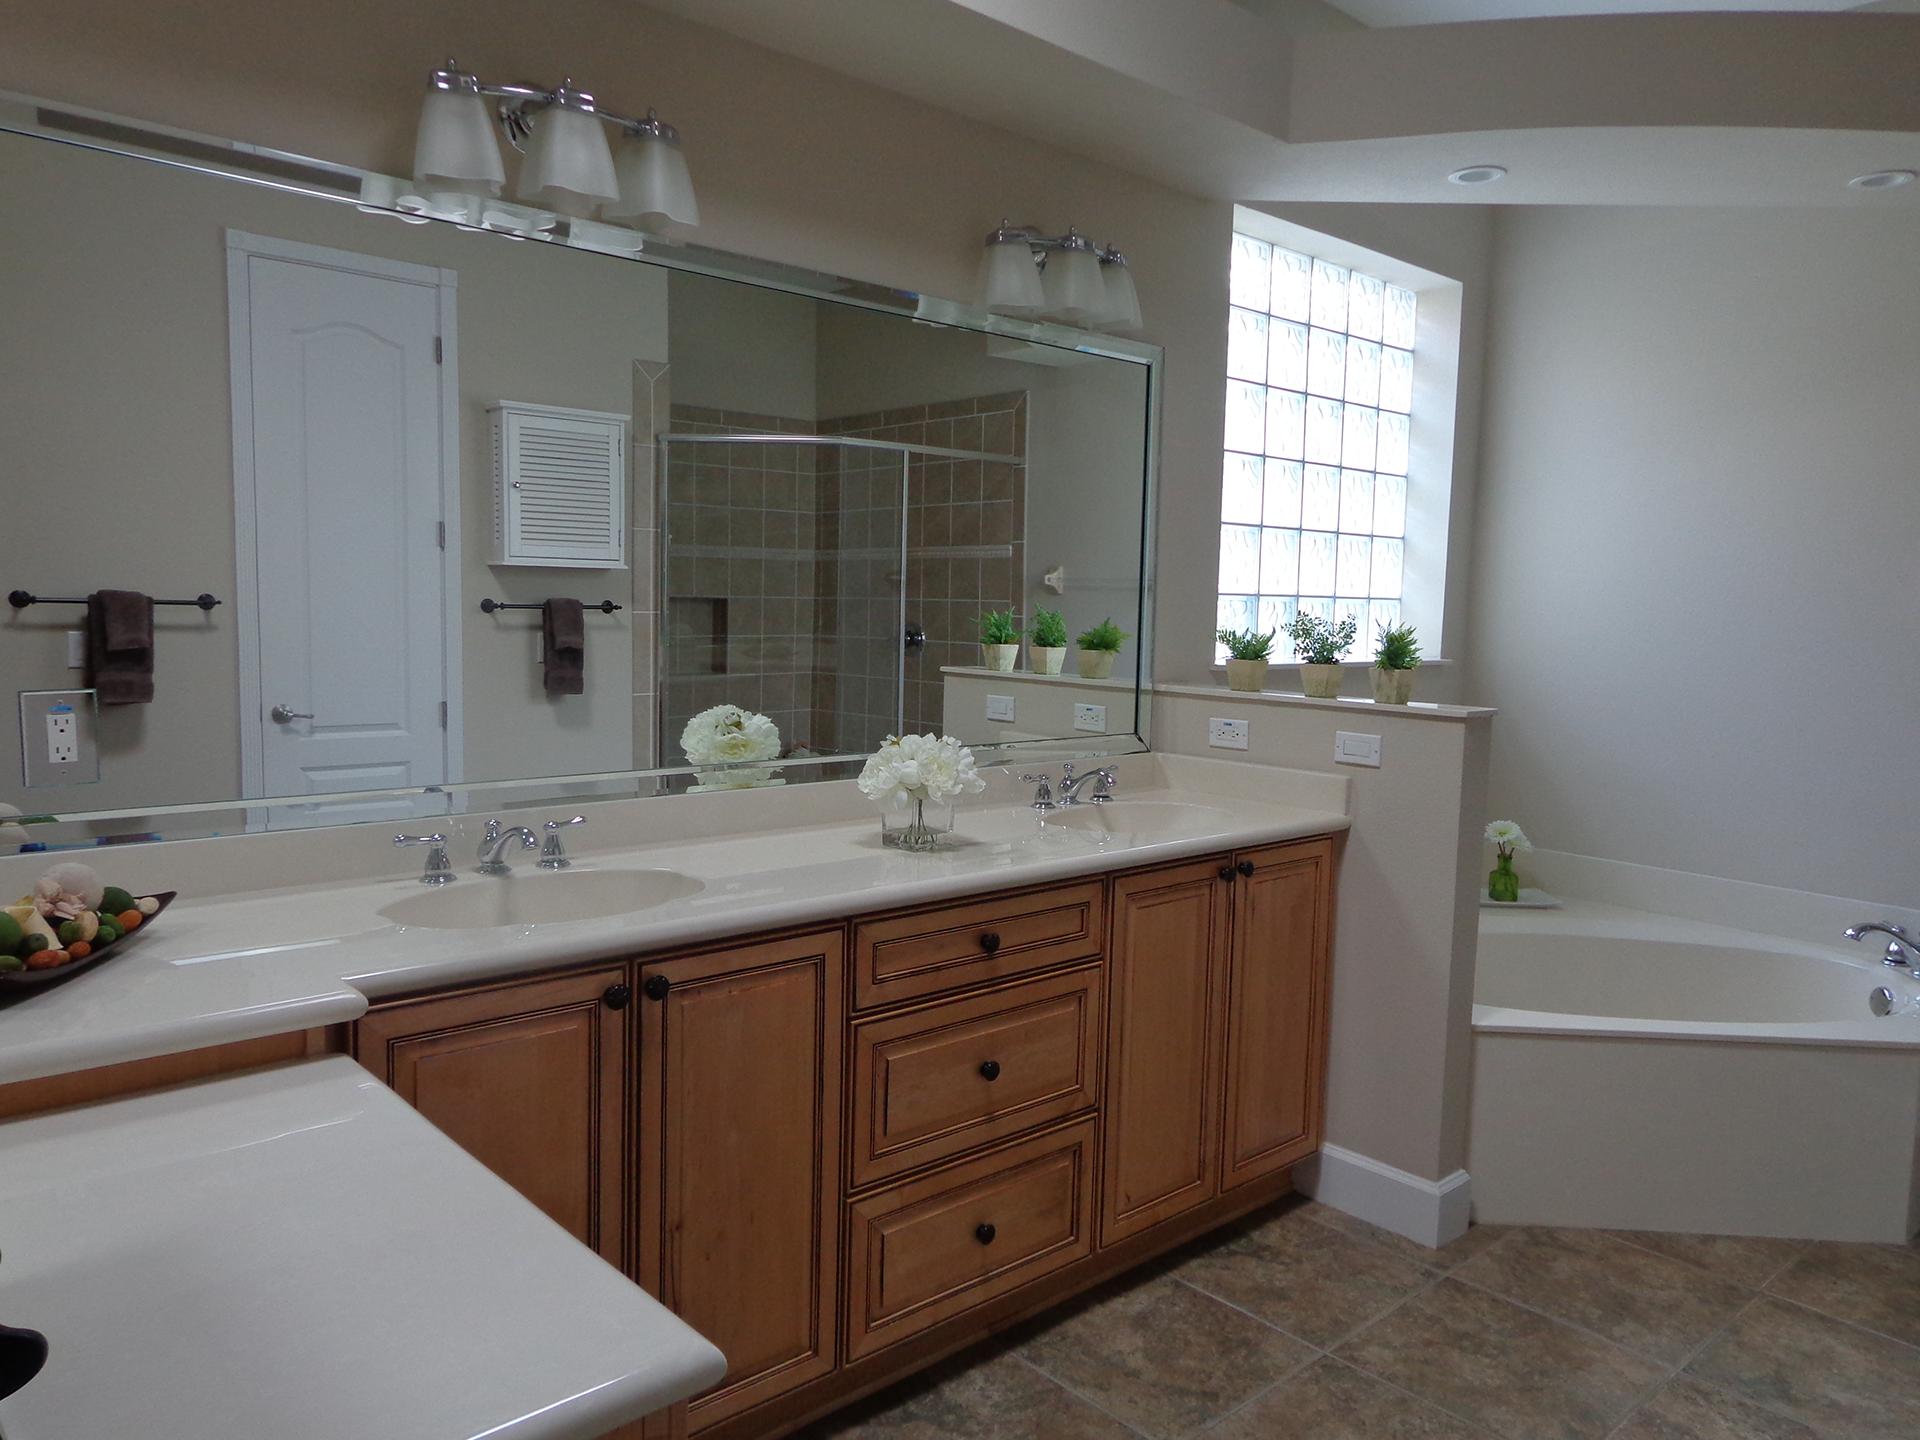 Staged-Assets-Home-Staging-Interior-Design-Palm-Coast-Florida-14